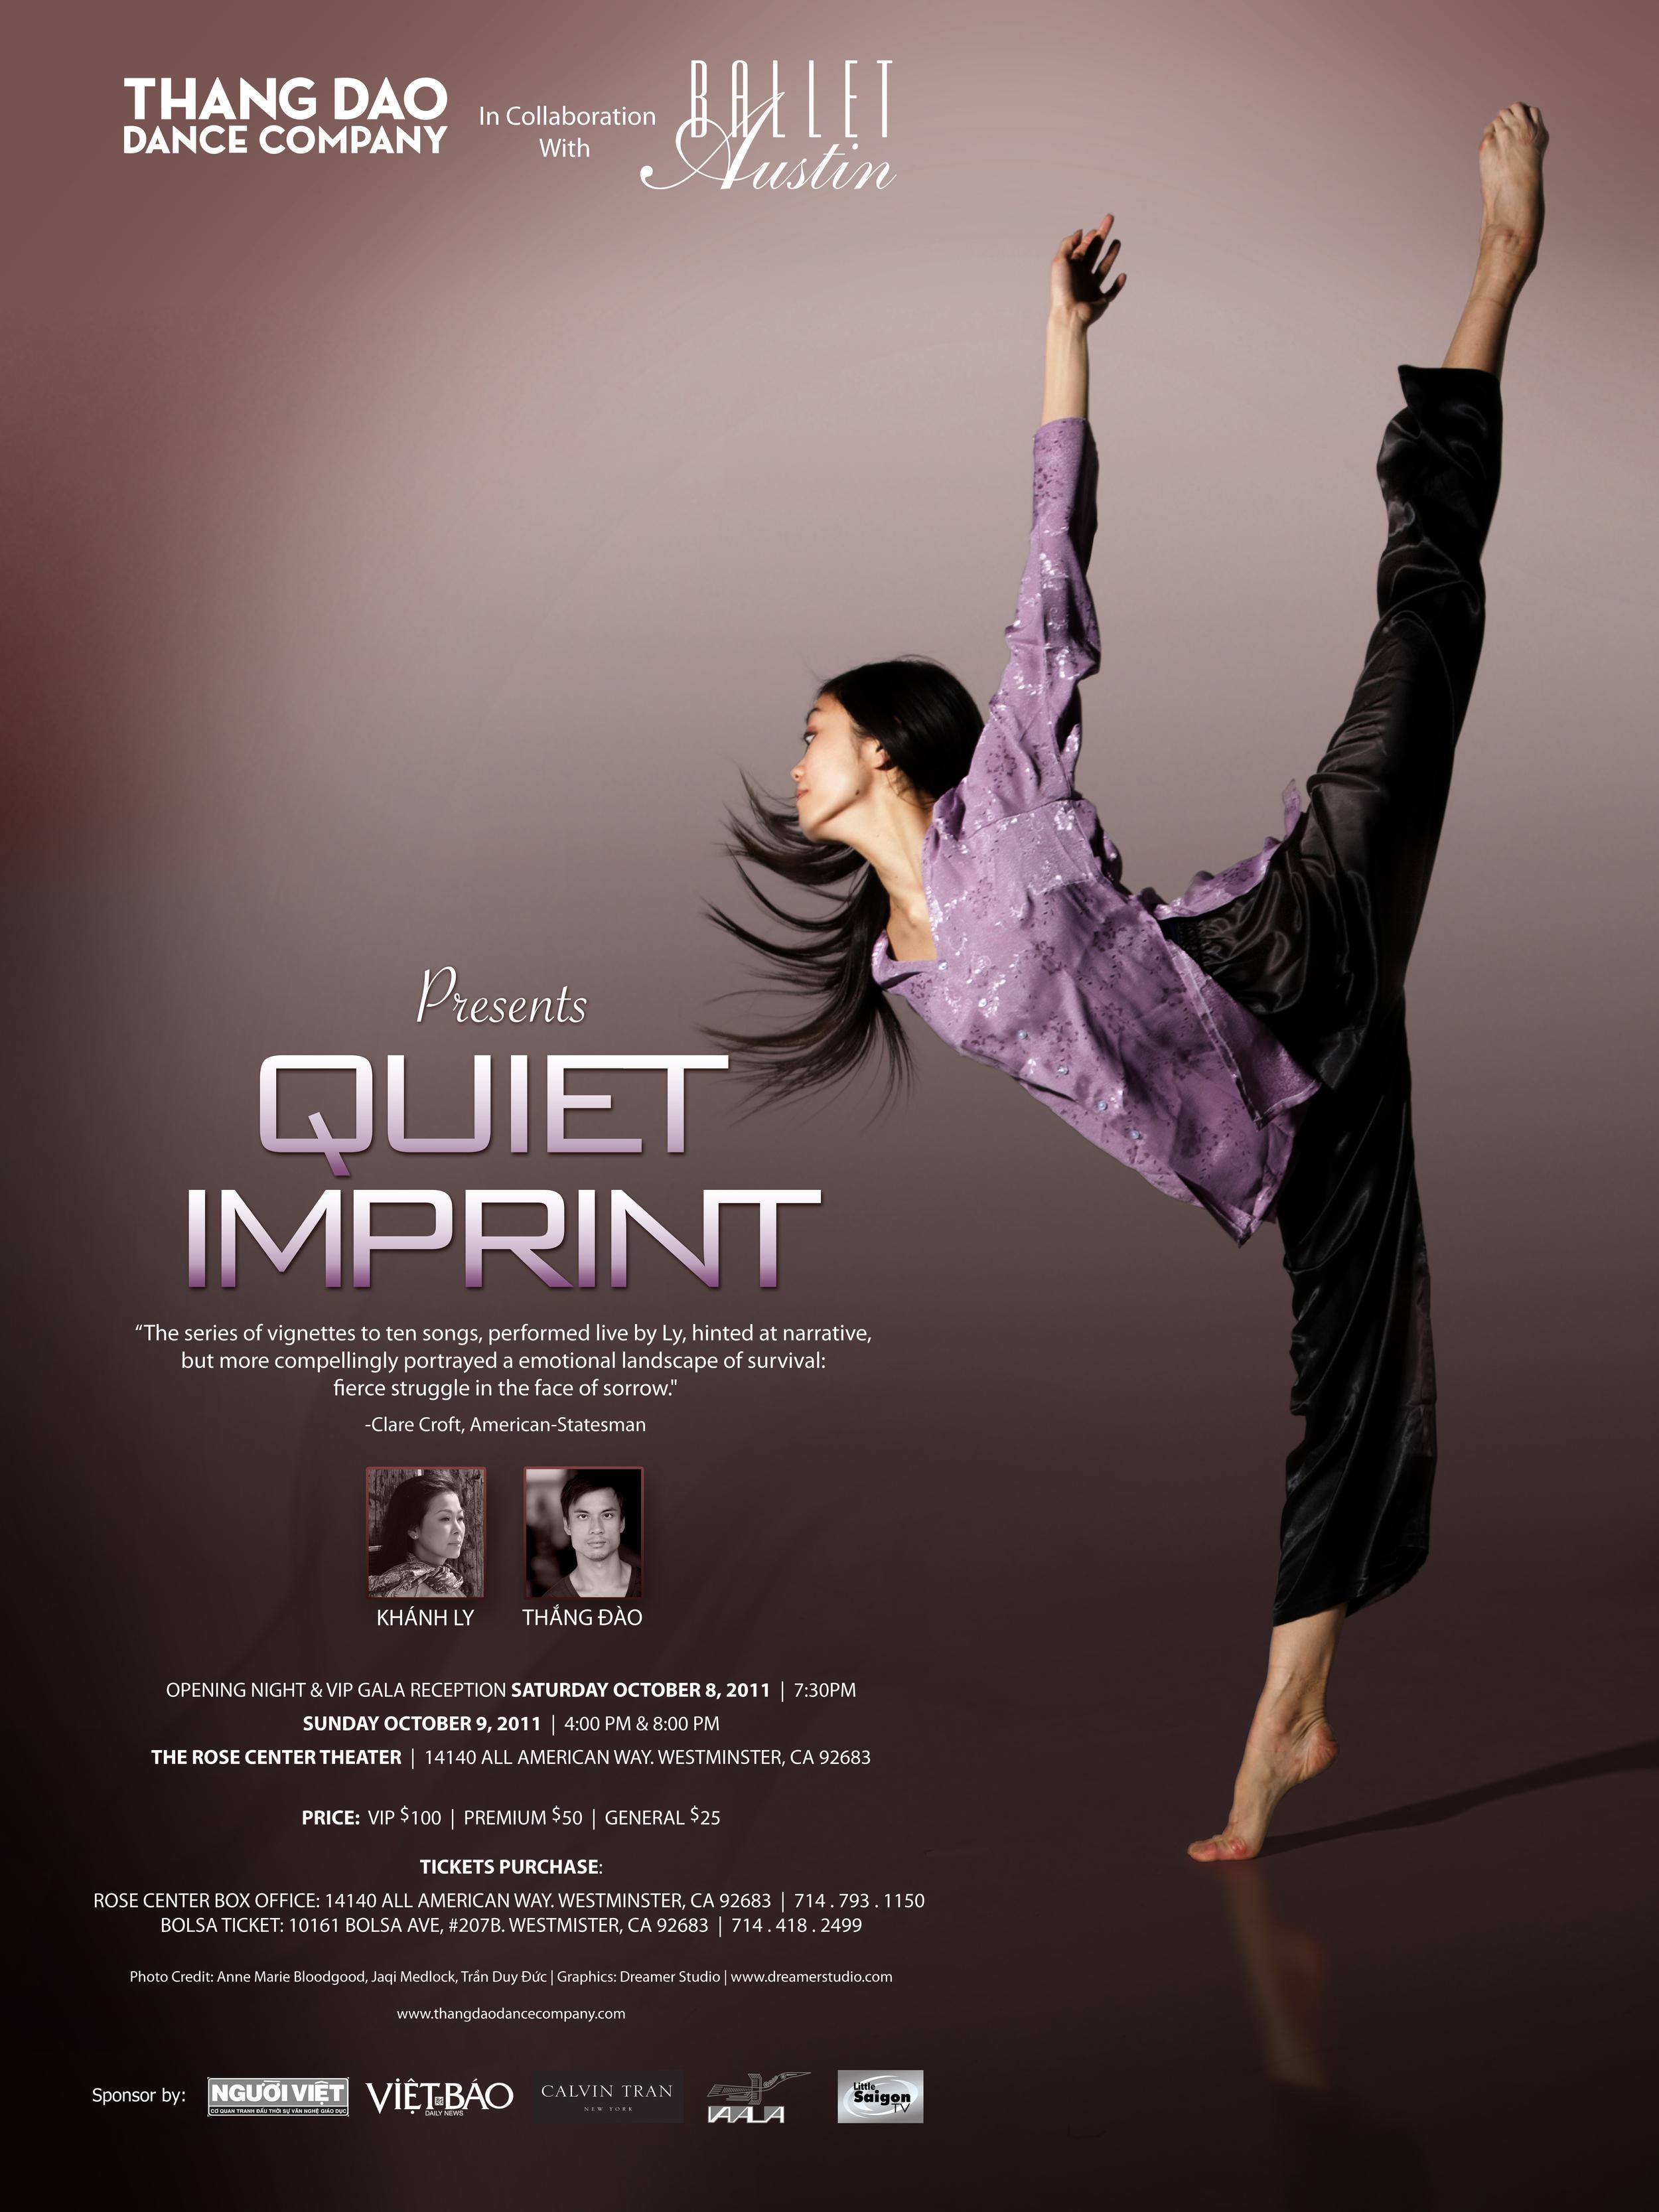 Quiet_Imprints_18x24_Englishv2.jpg